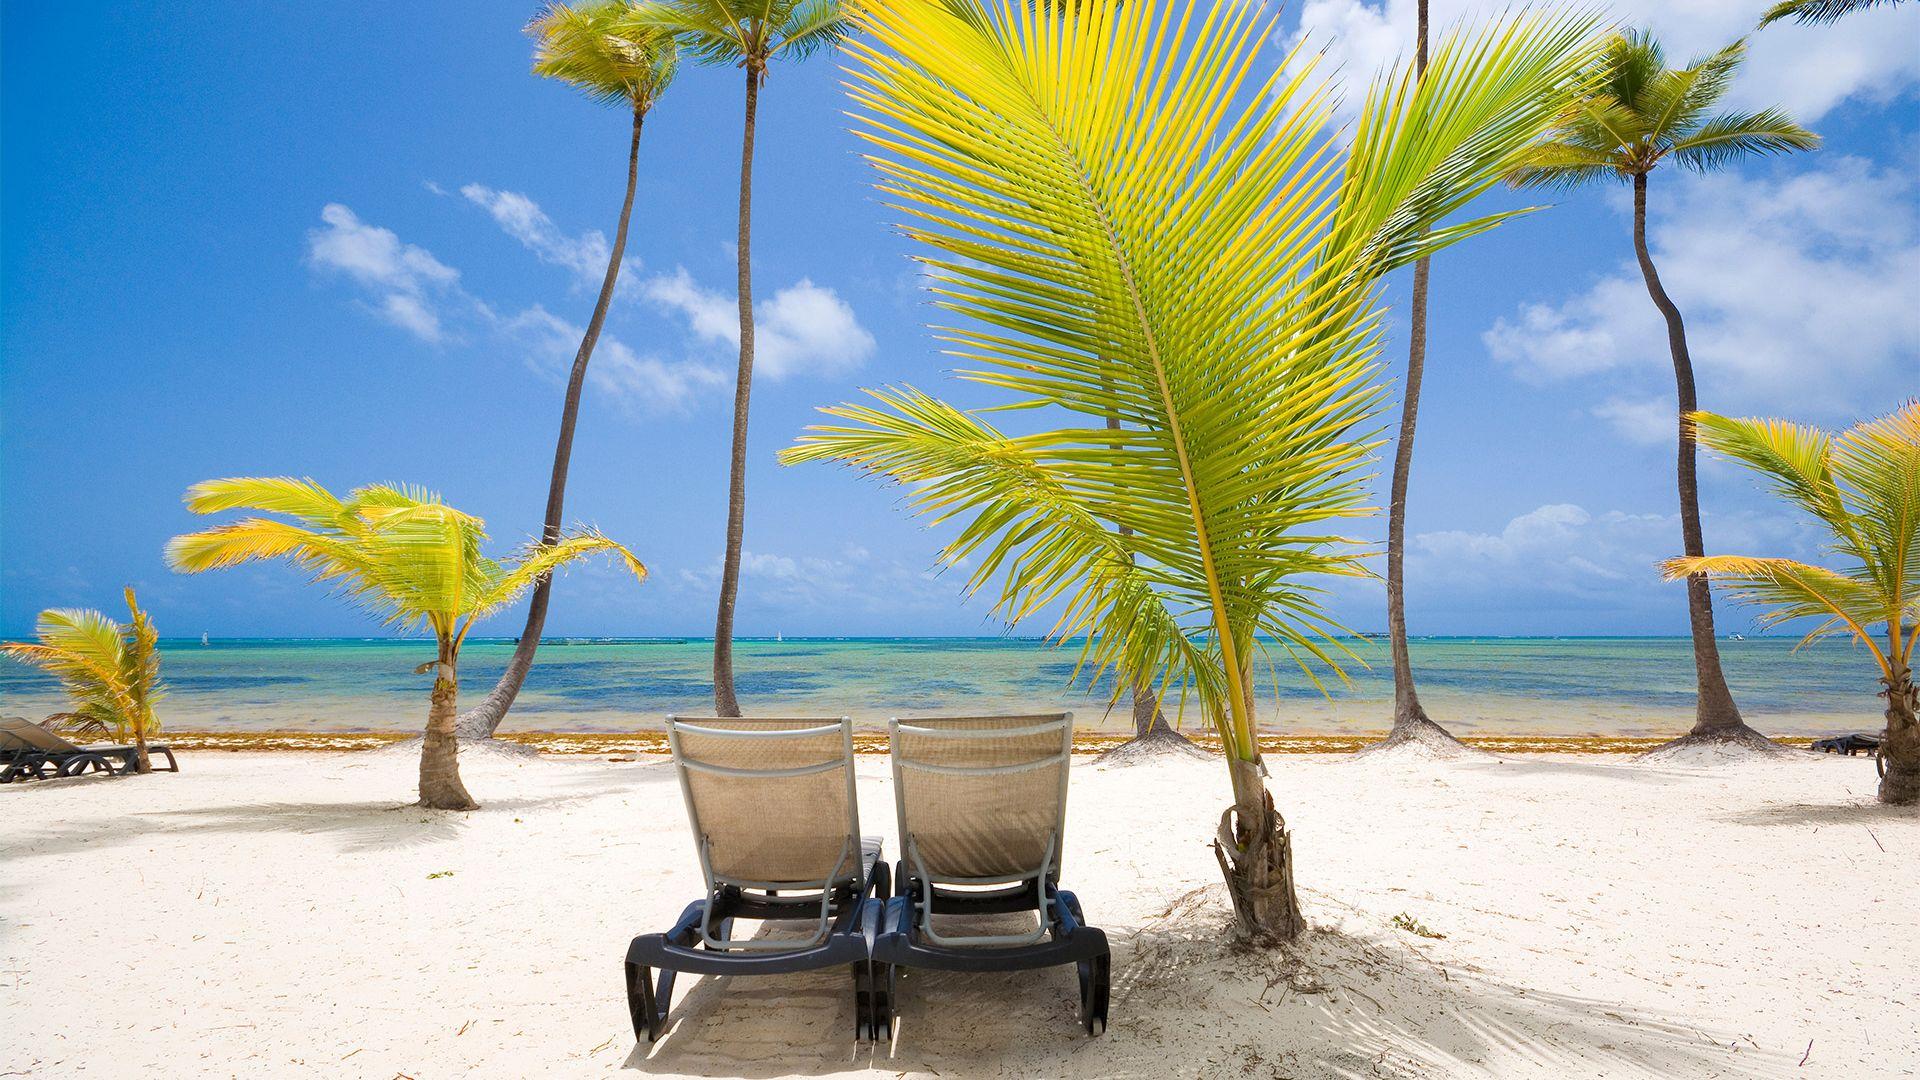 Sejur charter Punta Cana, 9 zile - ianuarie 2022